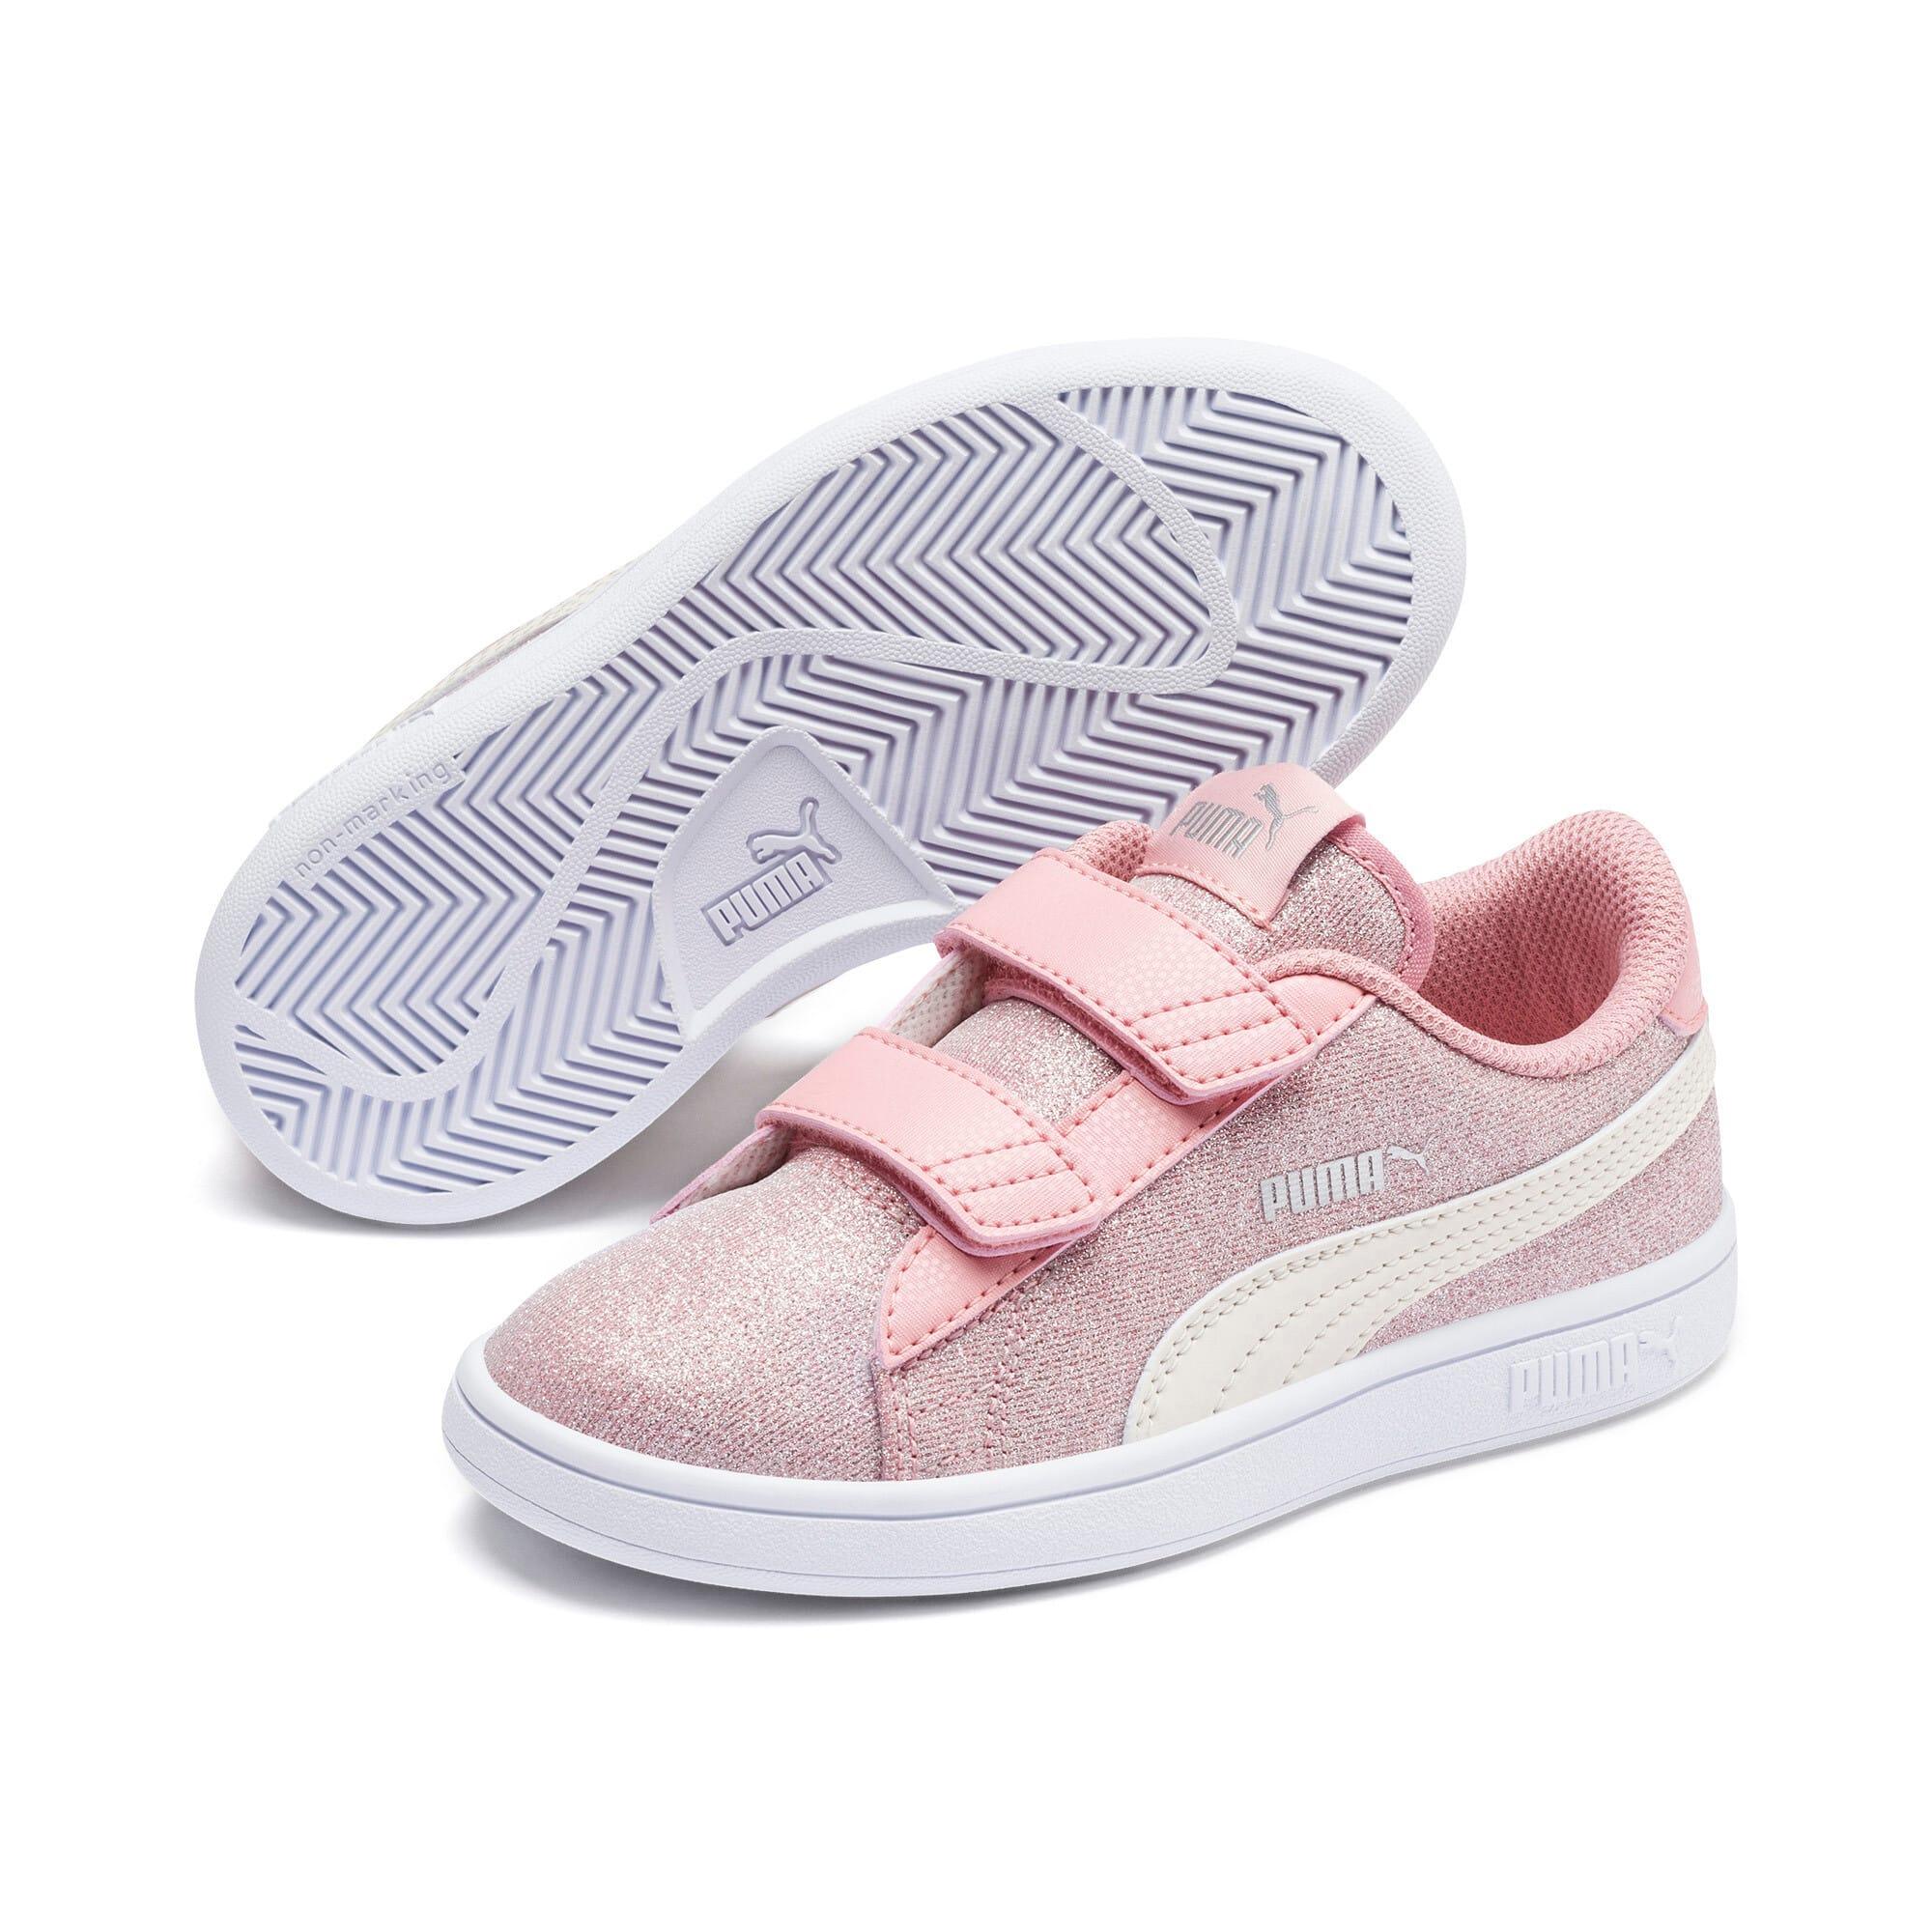 Thumbnail 2 of PUMA Smash v2 Glitz Glam Little Kids' Shoes, B Rose-P Parchment-Silv-Wht, medium